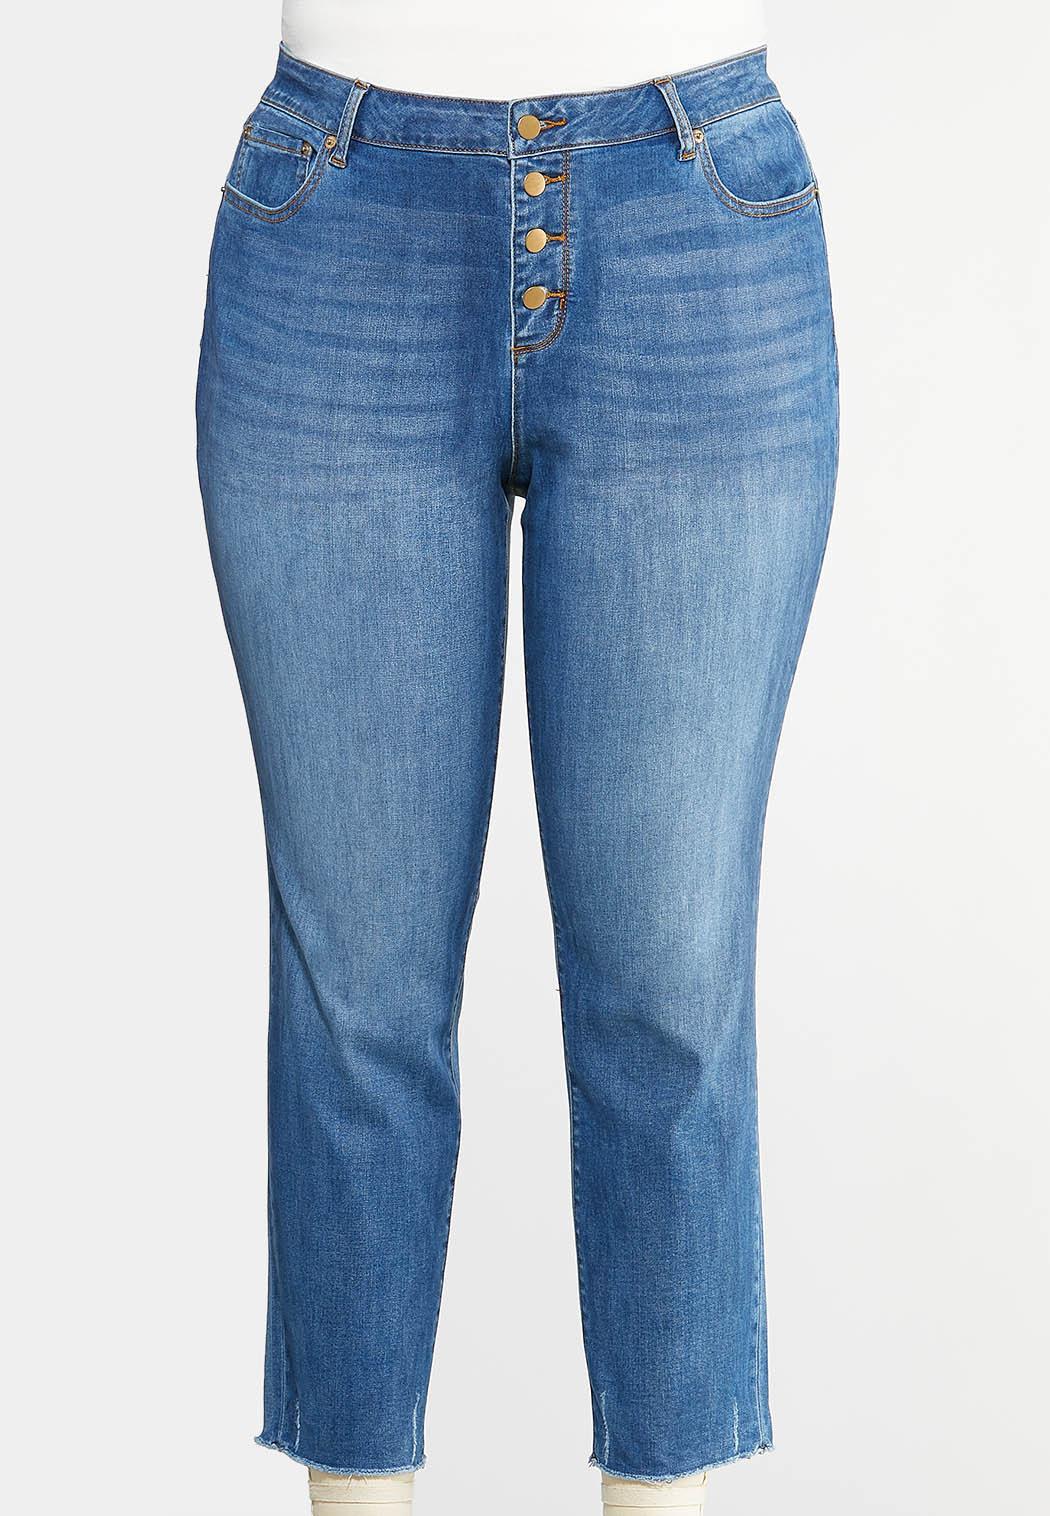 Plus Size Buttonfly Raw Hem Jeans